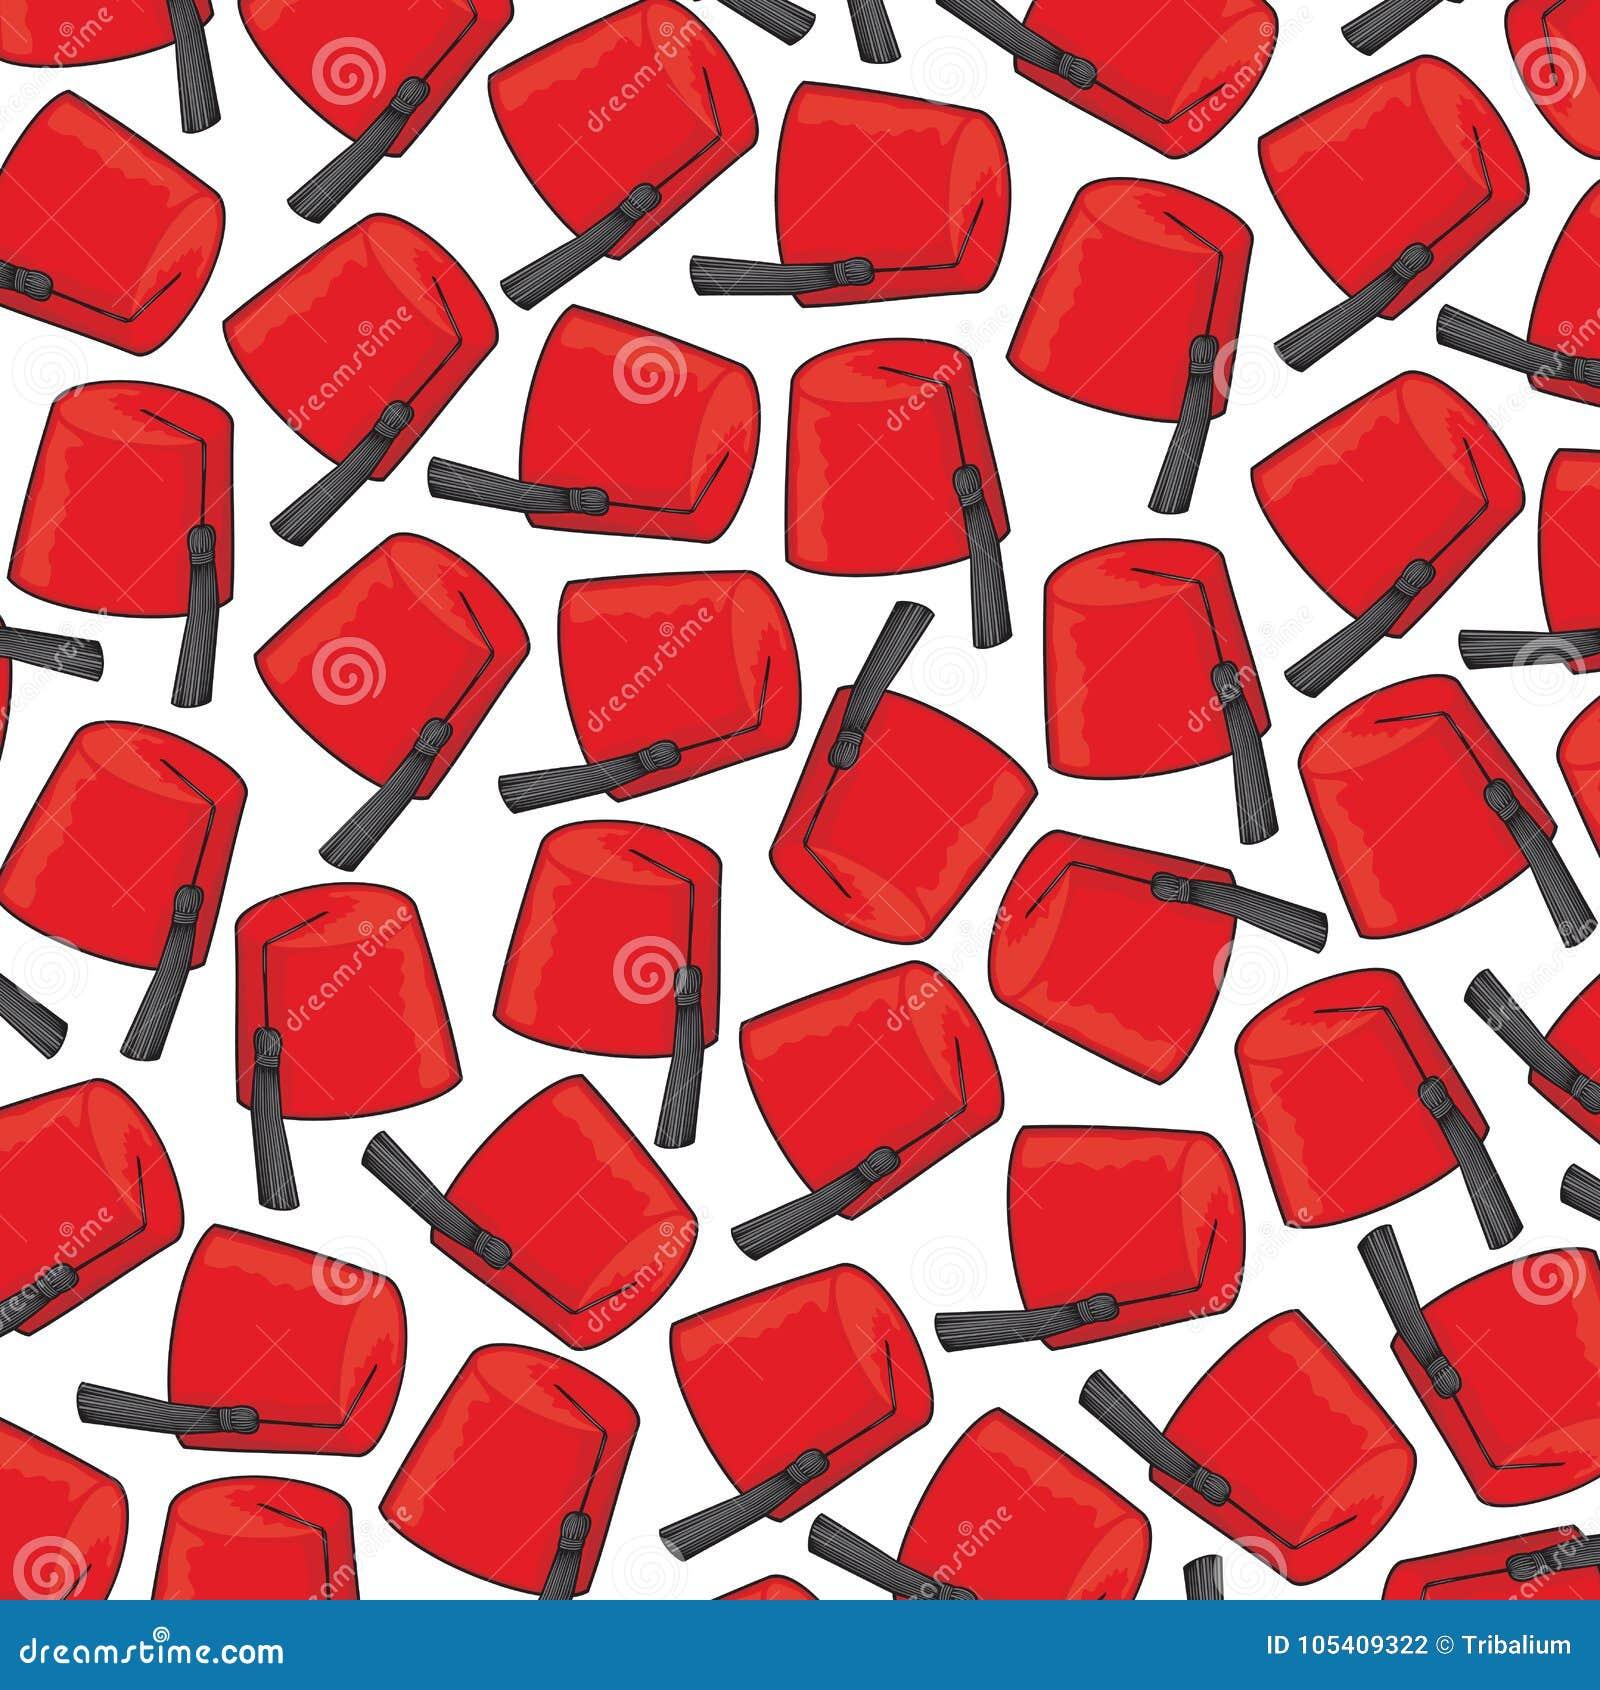 Fez - Fez Hat Clip Art Transparent PNG - 591x1000 - Free Download on NicePNG